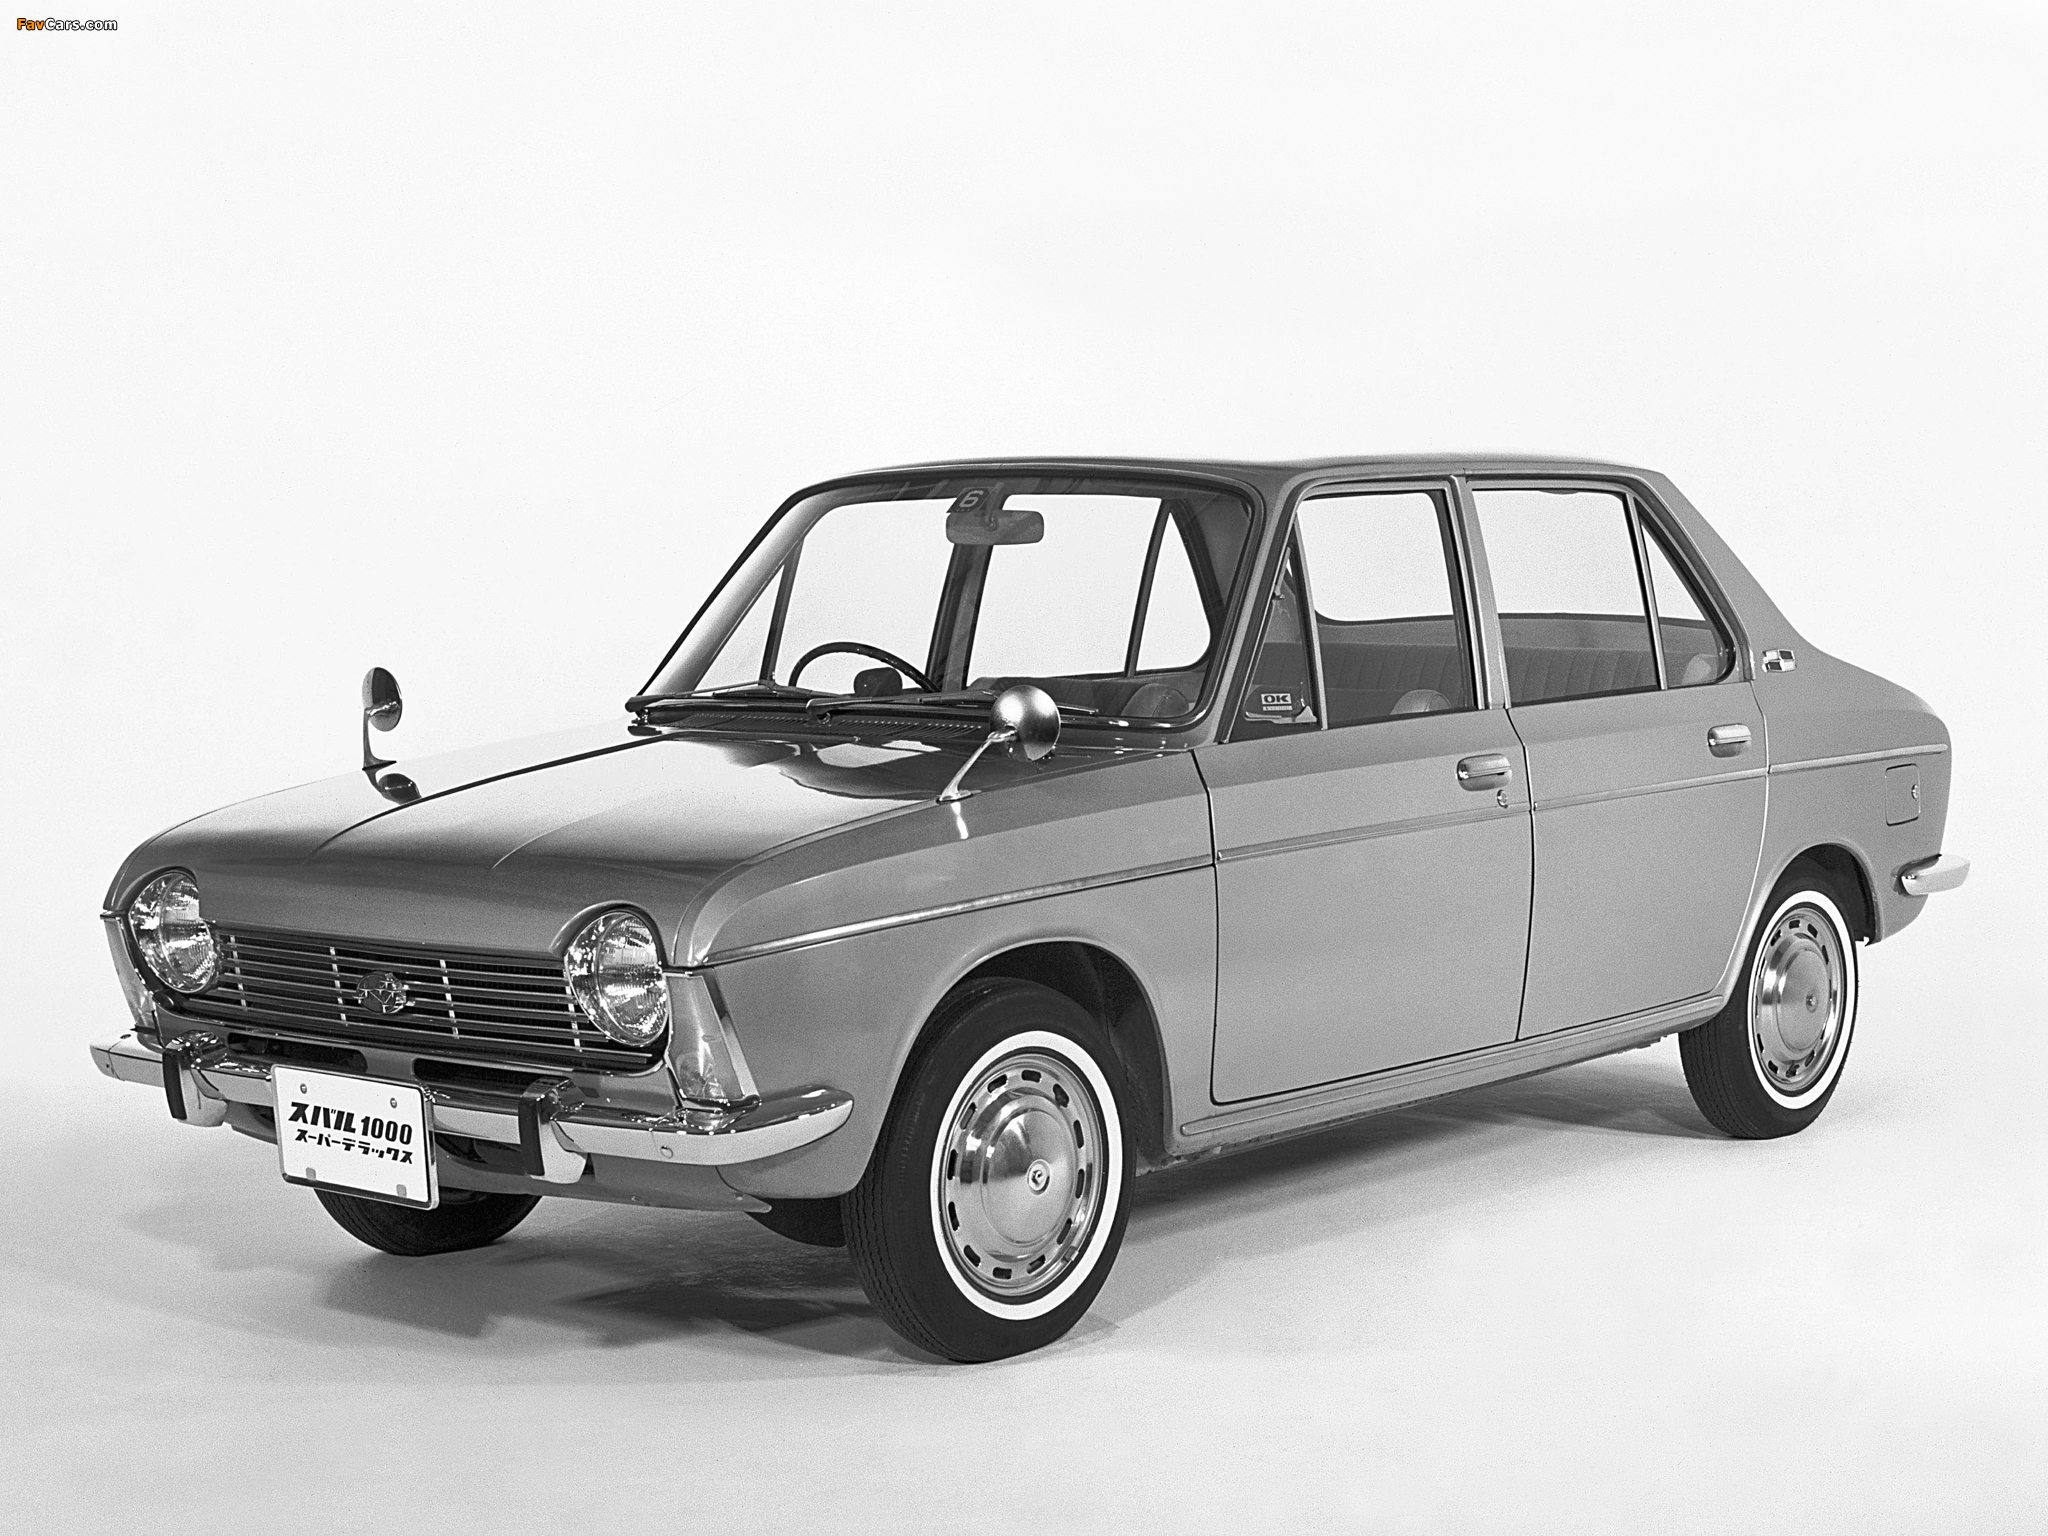 Subaru 1000 4 Door Sedan 1965 69 Wallpapers 2048x1536